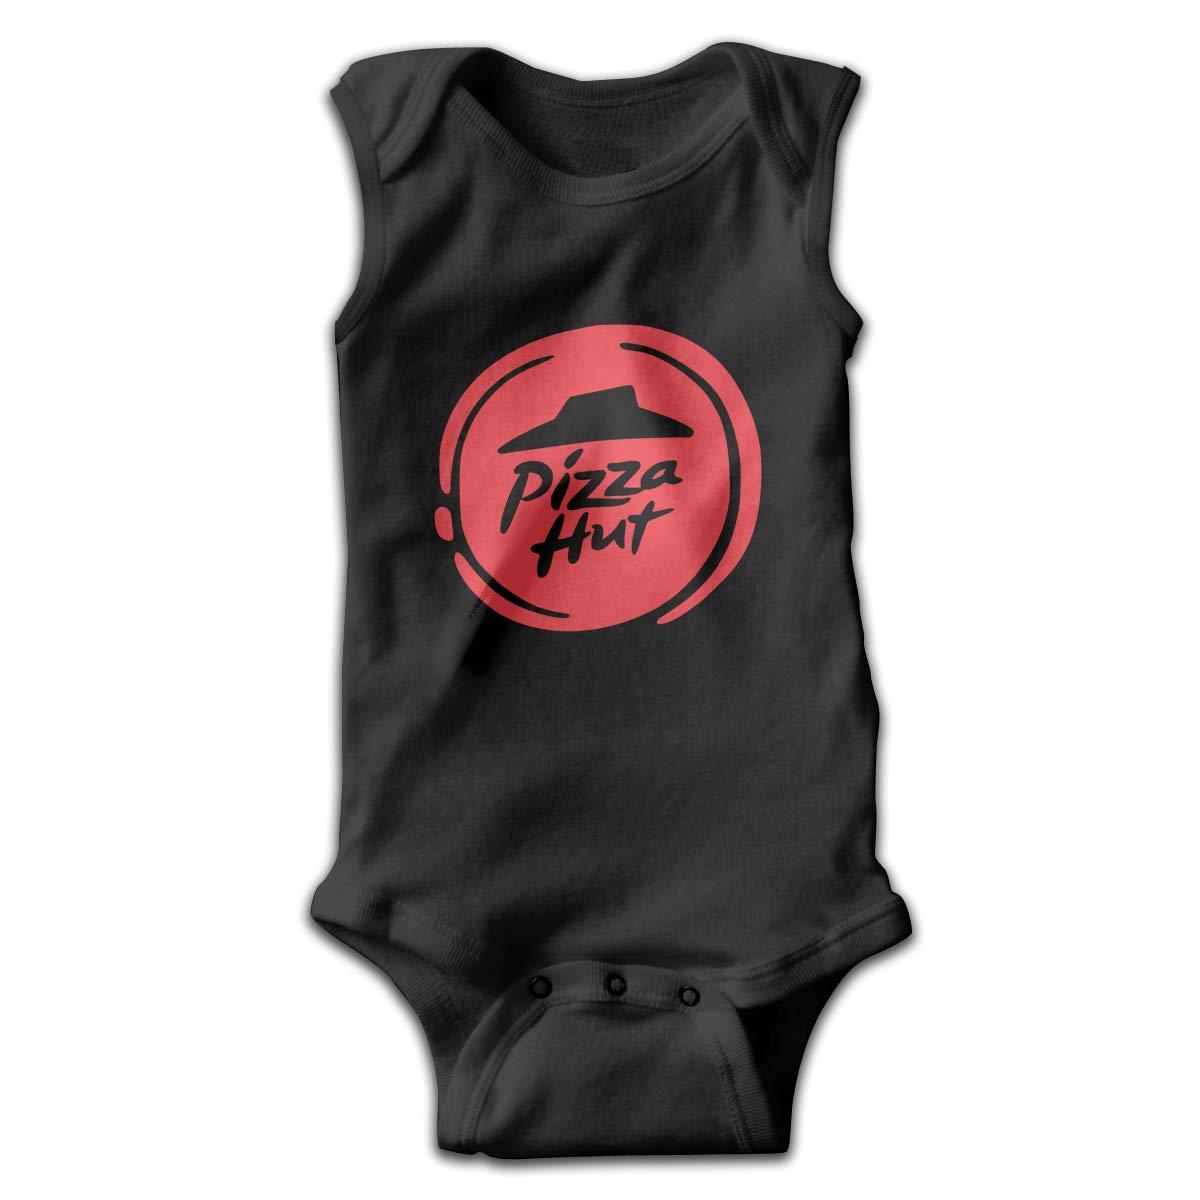 Pizza Slice Low Profile Logo Smalls Baby Onesie,Infant Bodysuit Black